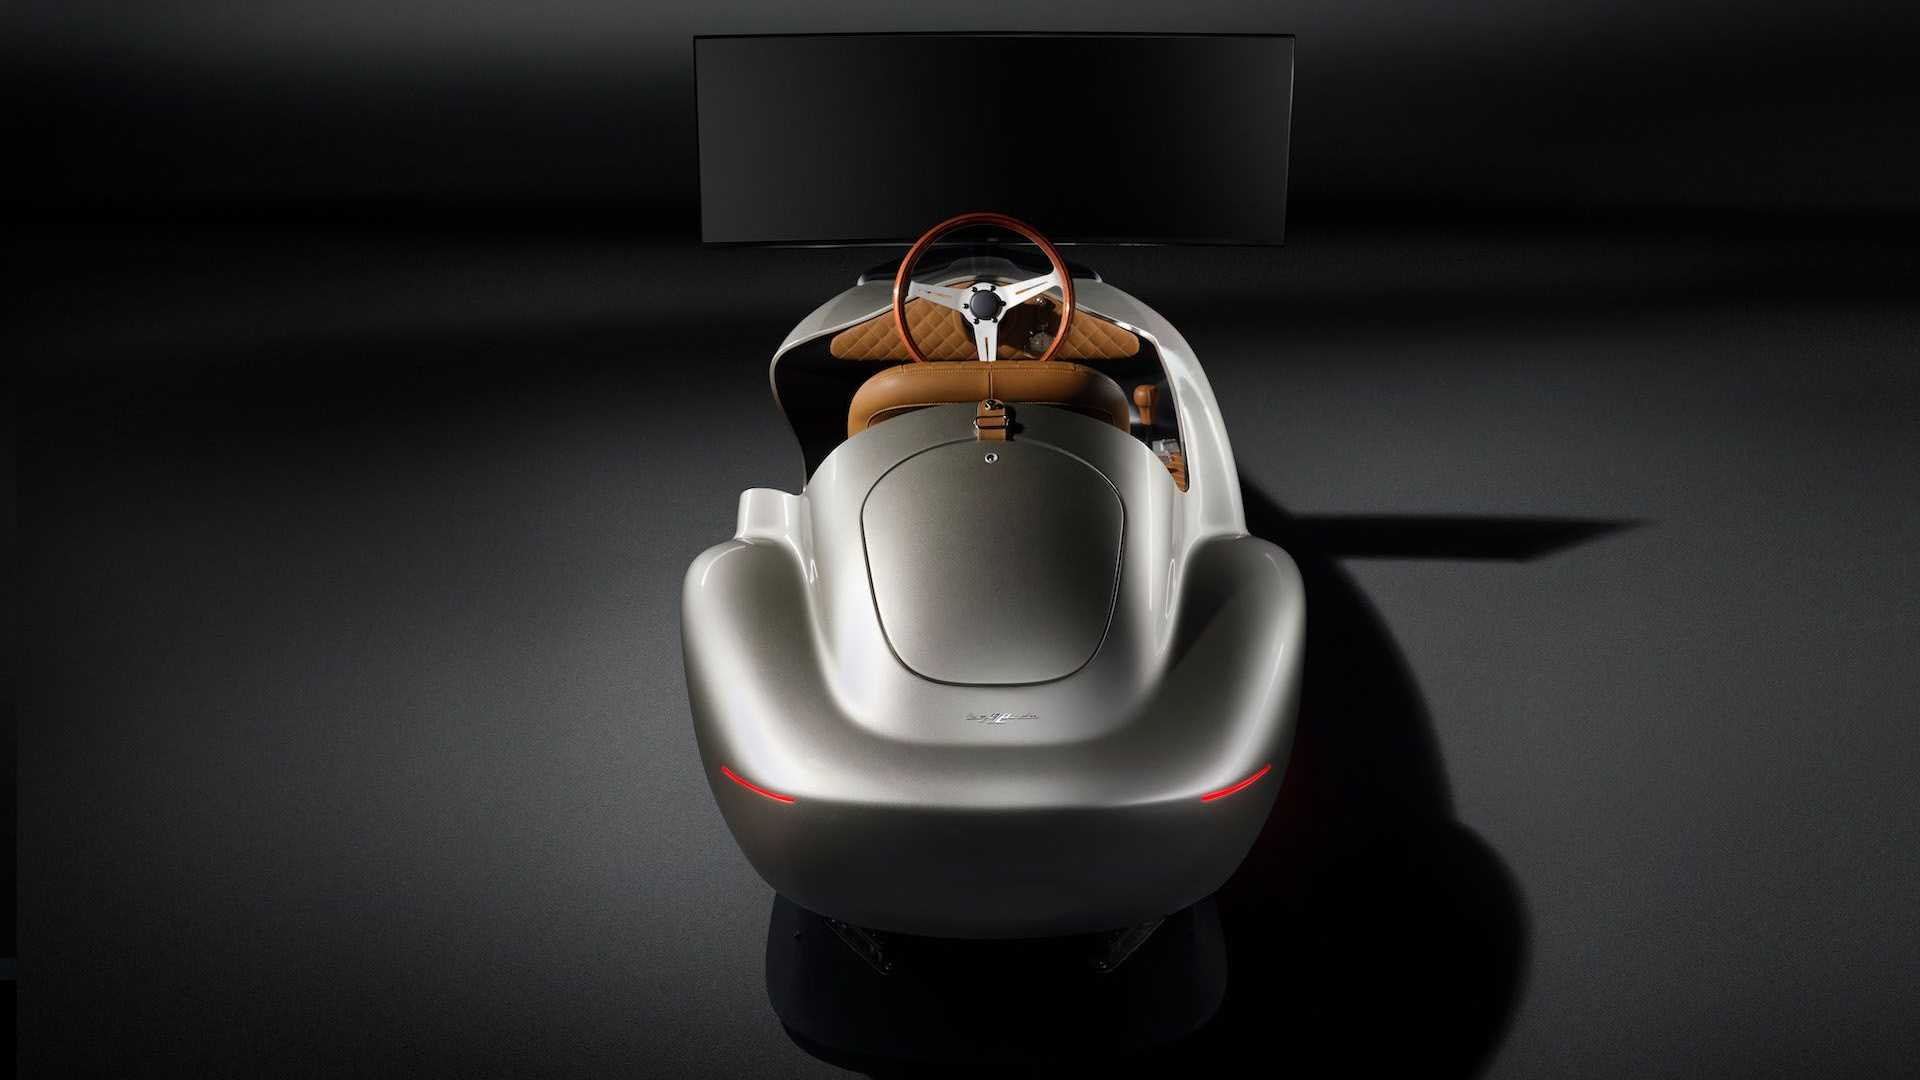 pininfarina-leggenda-eclassic-simulator-for-sale-1.jpg